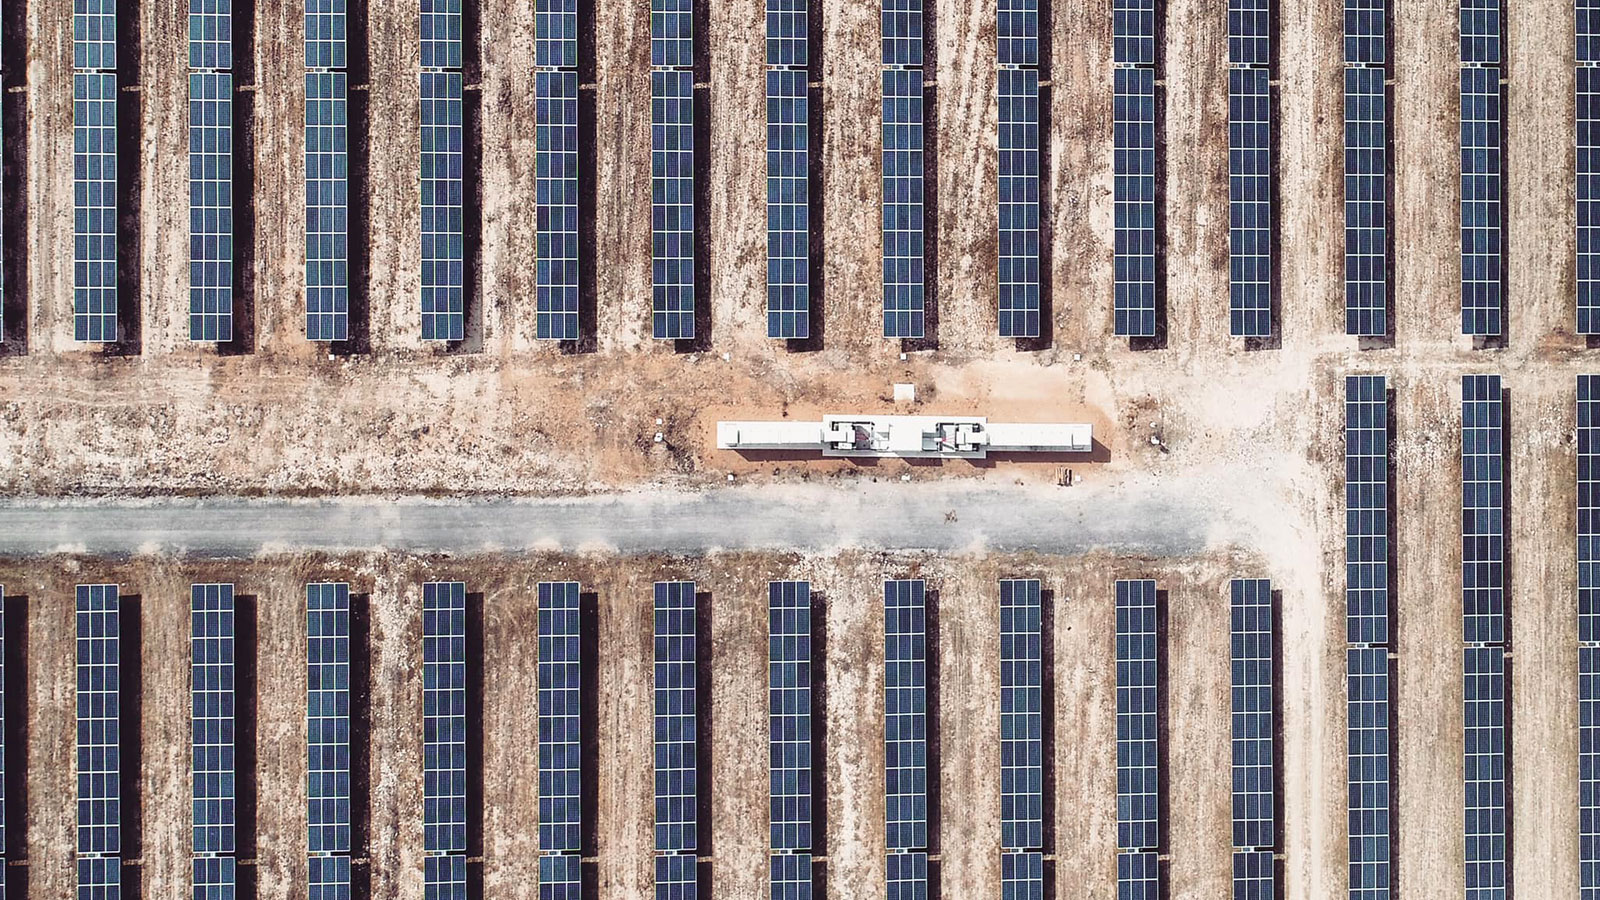 solar park capture with a drone